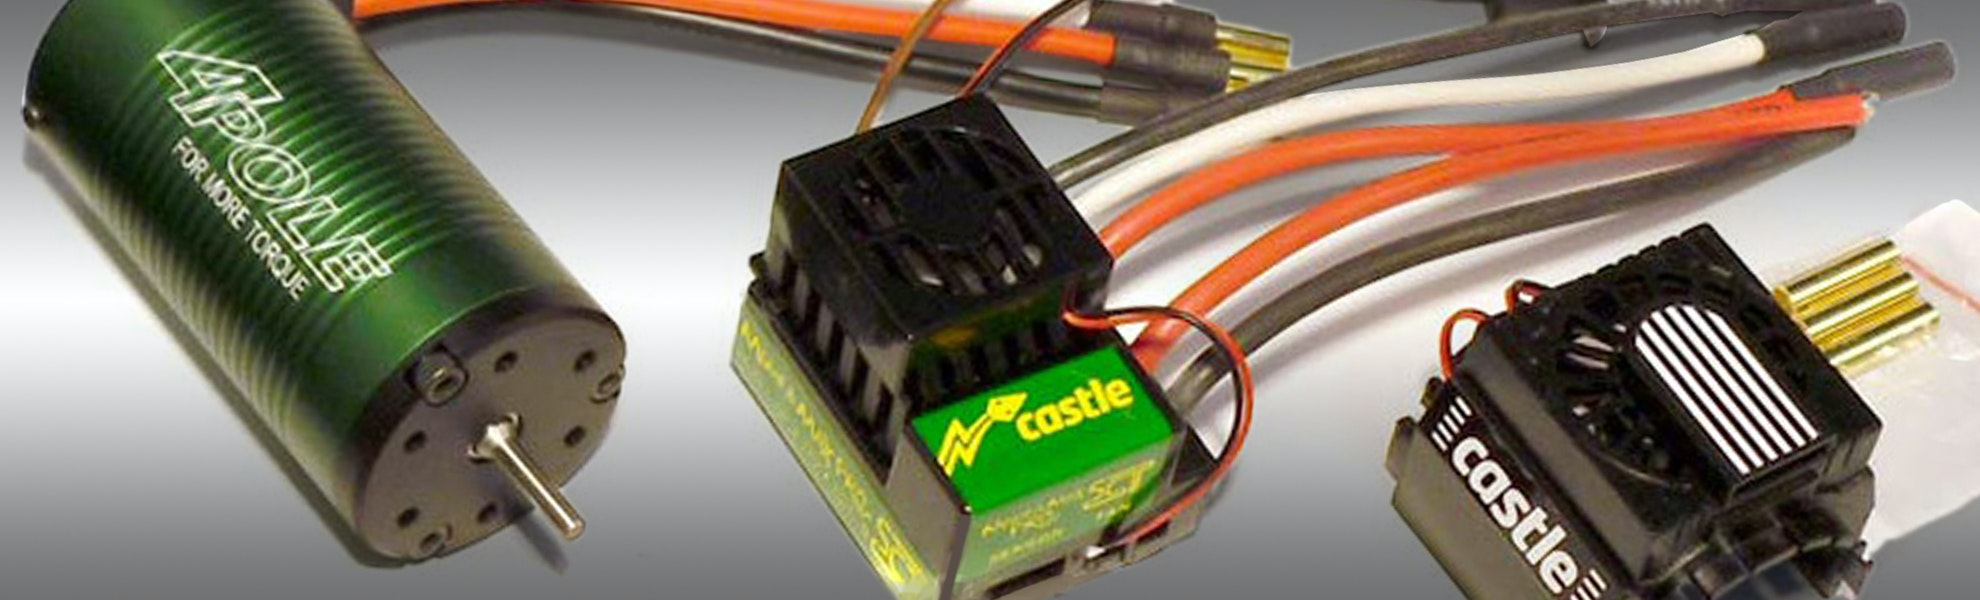 Castle Creations Mamba Max Pro SCT Combo 2400kv